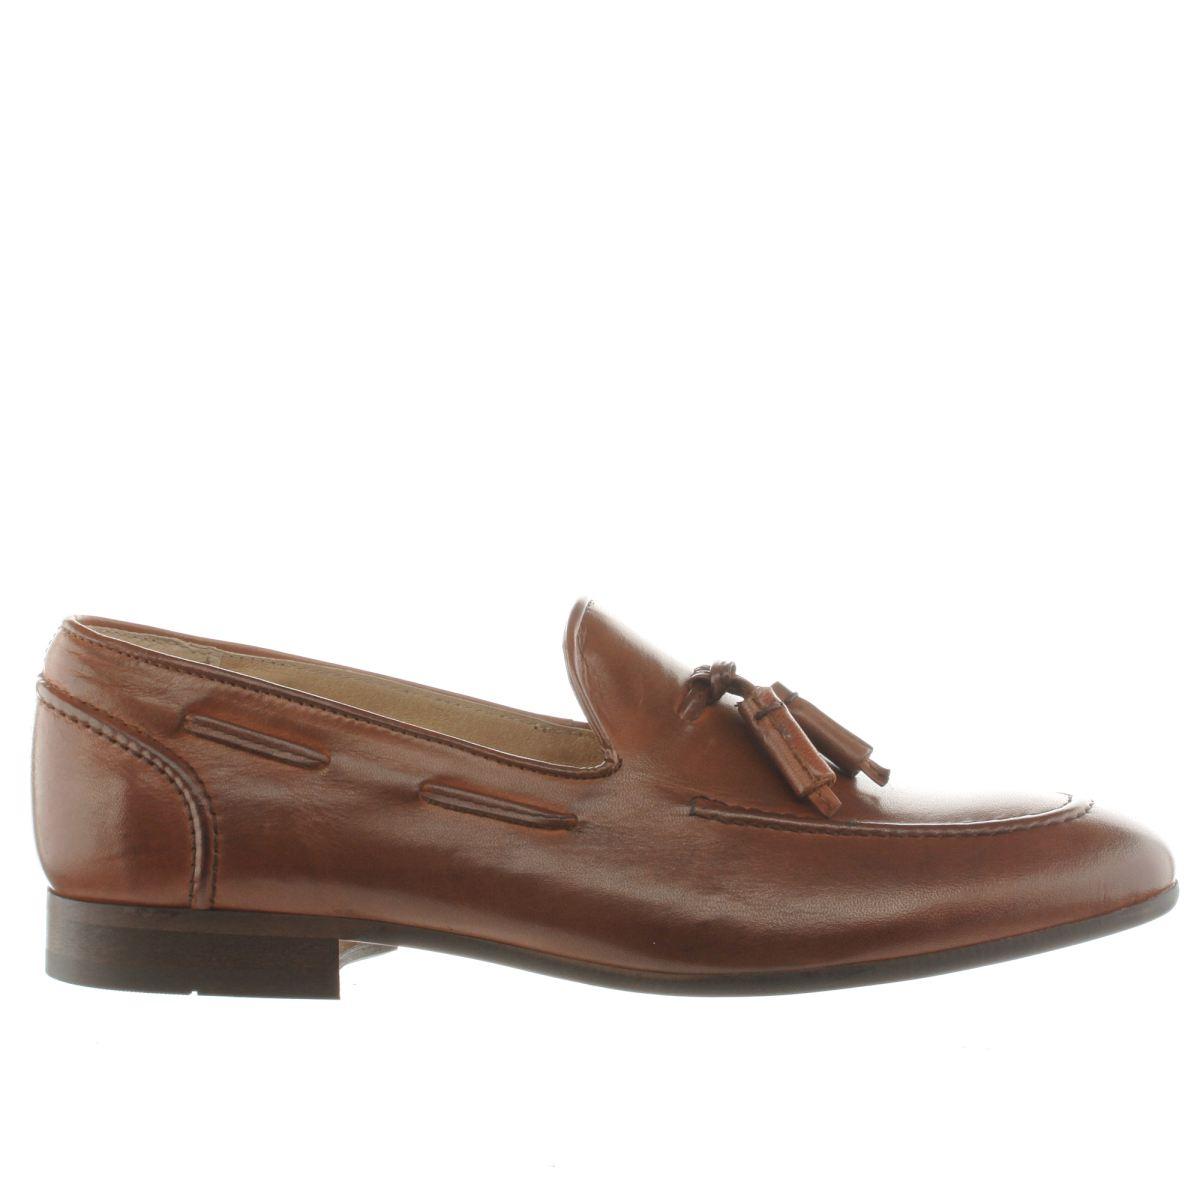 h by hudson tan rene tassel shoes